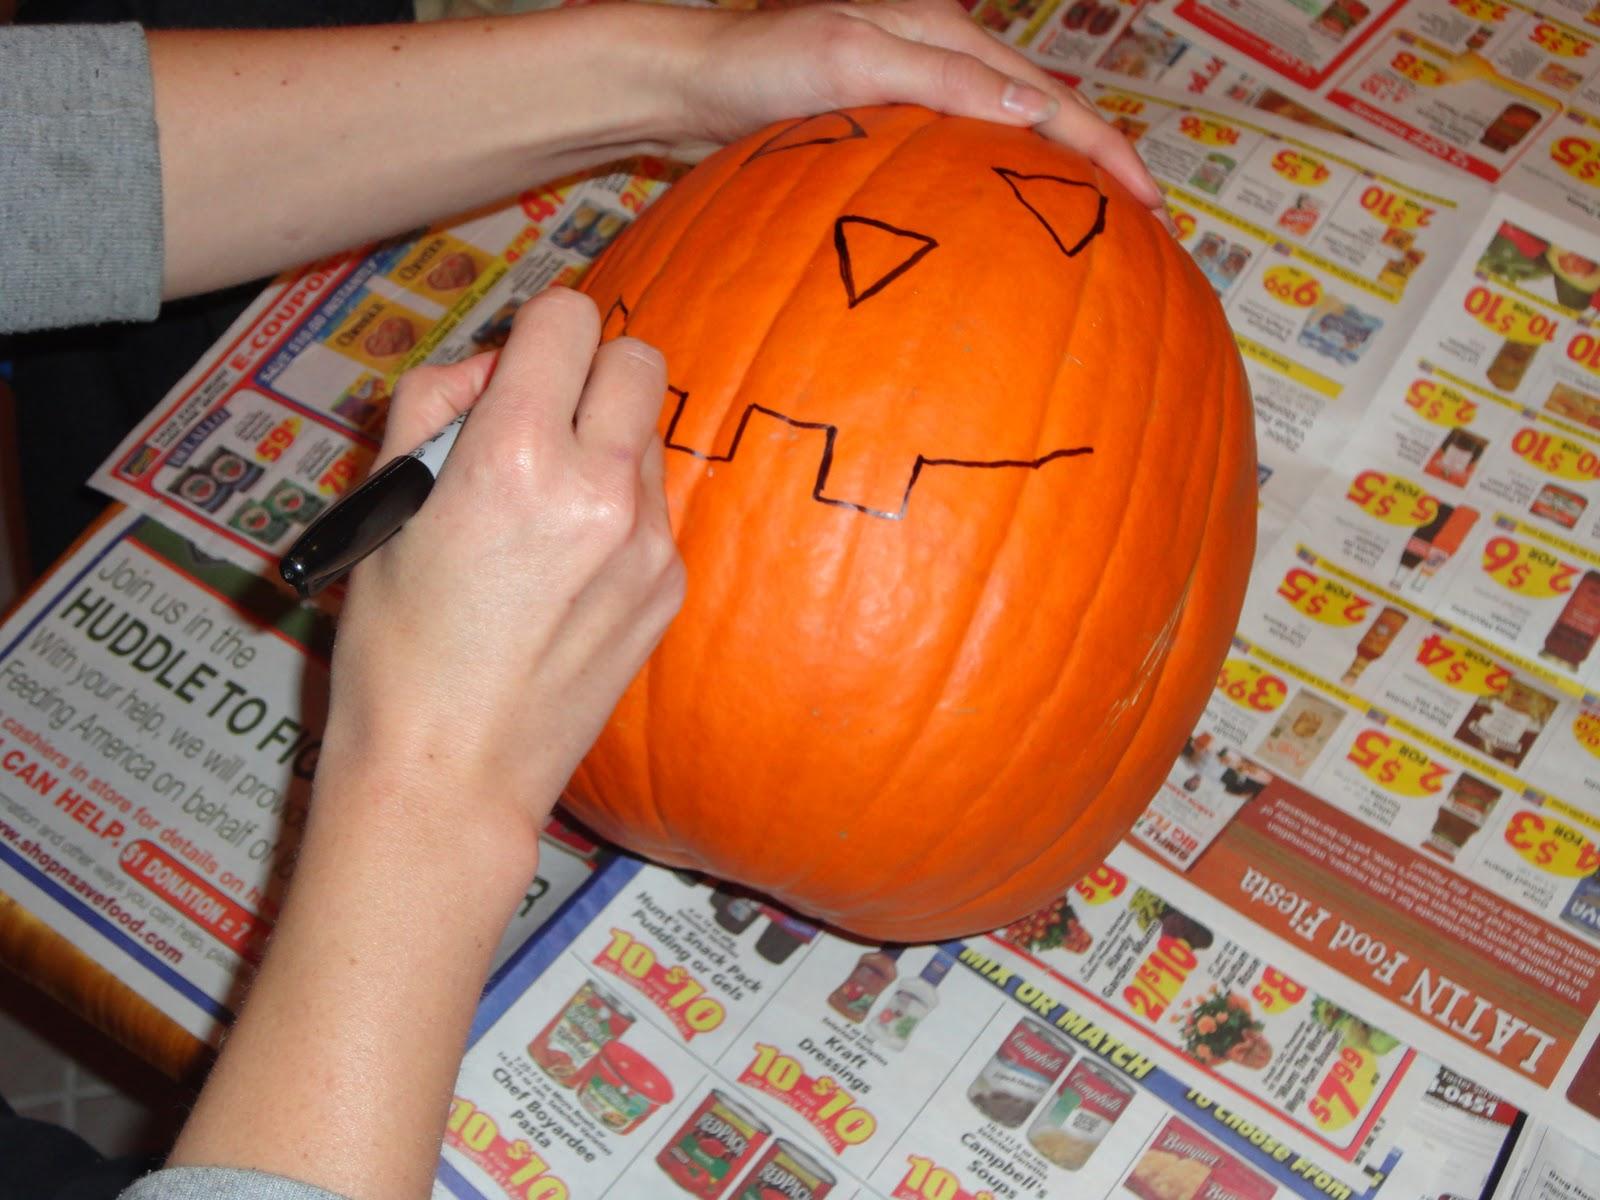 Pumpkin Seed Drawing Drawing my Pumpkin's Face